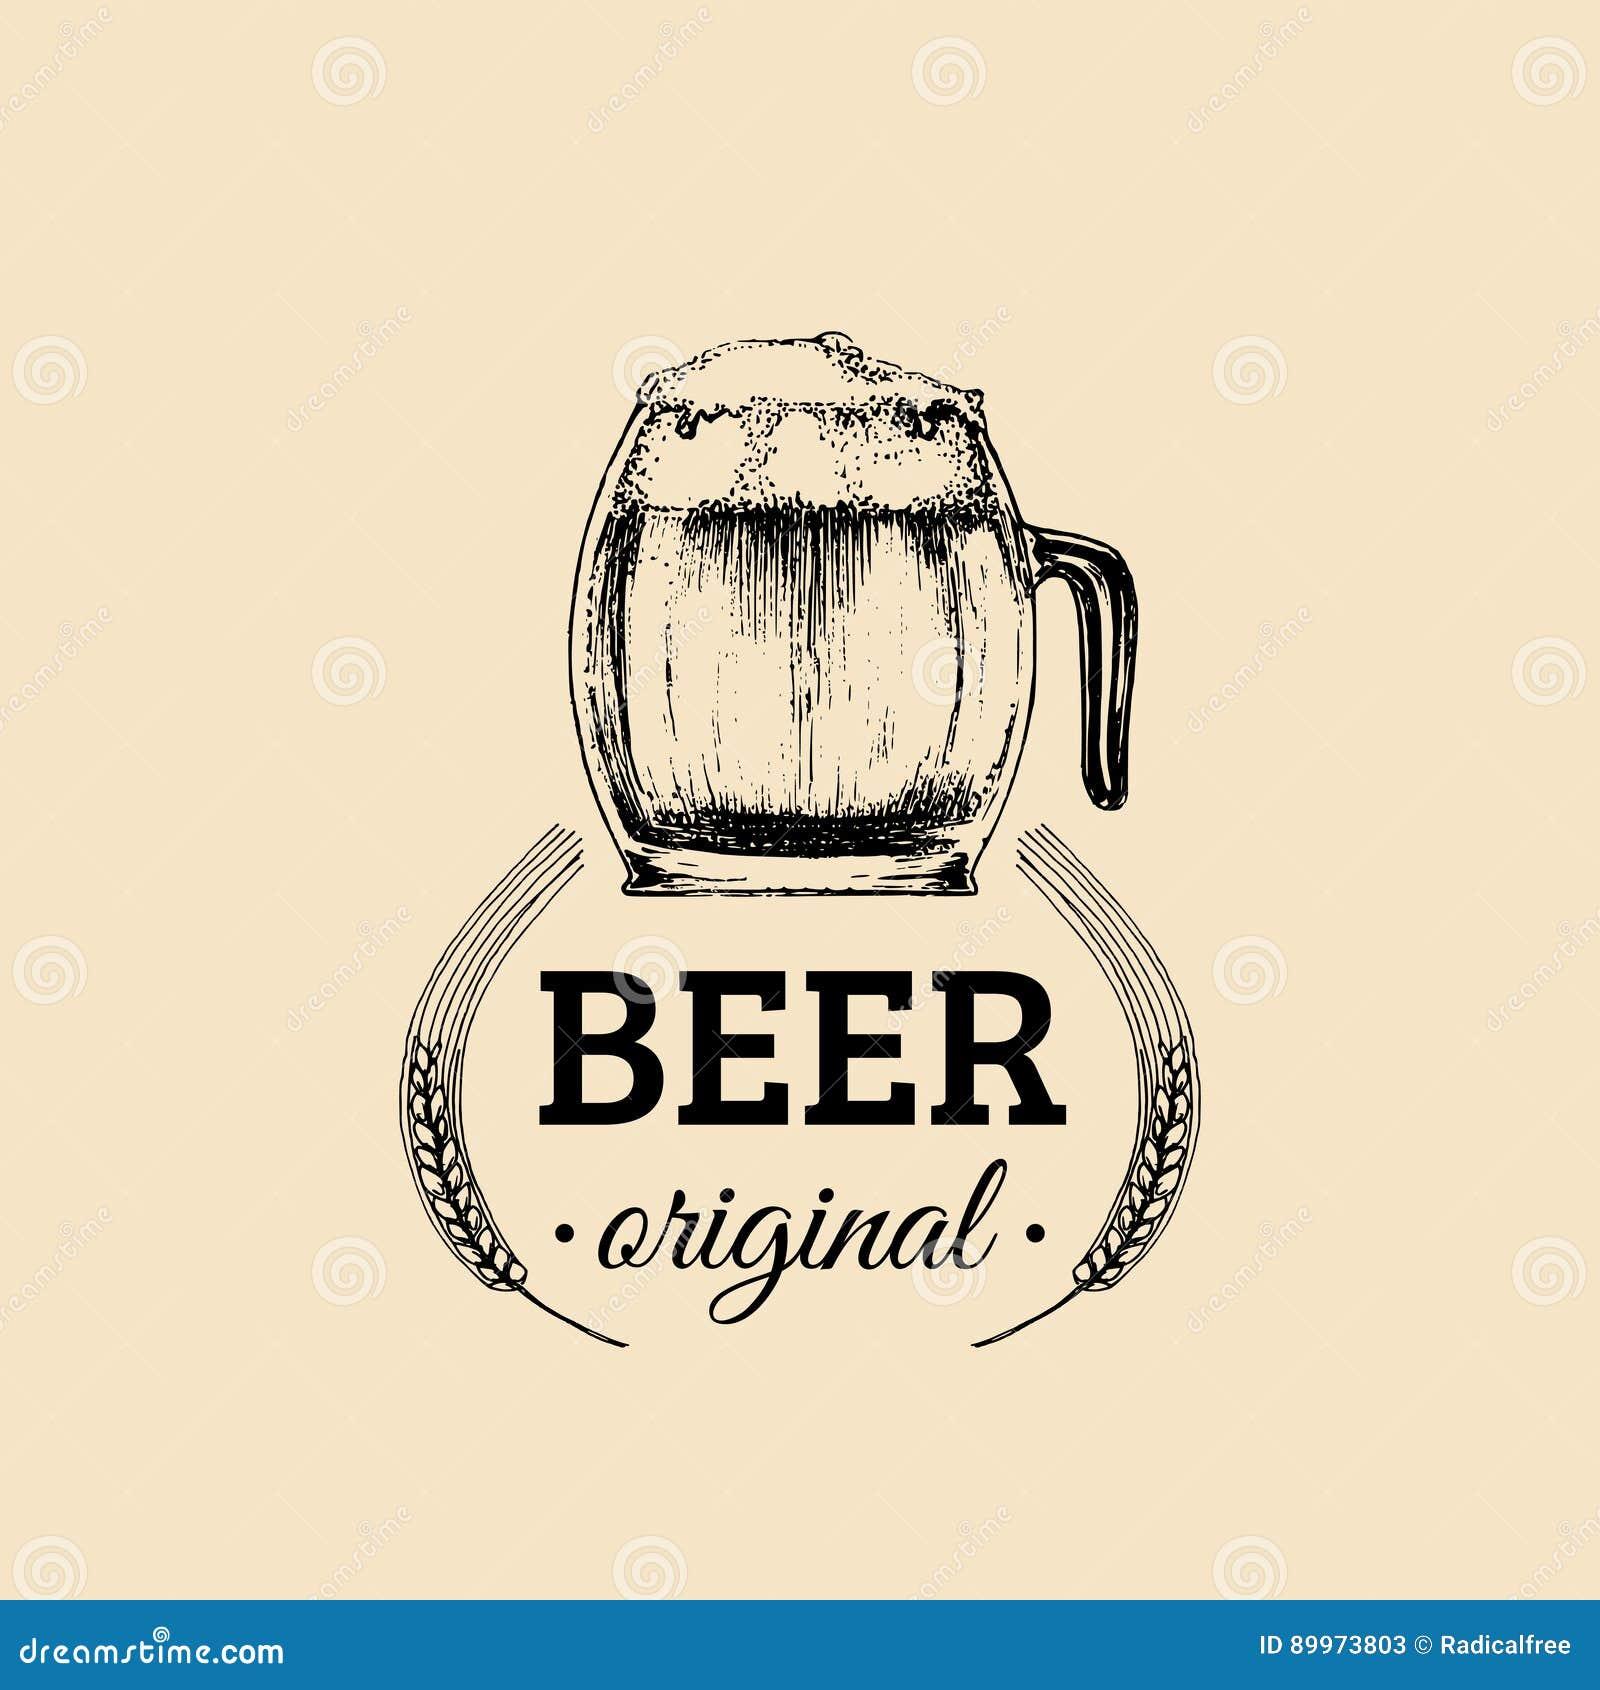 Kraft Beer Mug Logo Lager Cup Retro Sign Hand Sketched Ale Glass Illustration Vector Vintage Homebrewing Label Badge Stock Vector Illustration Of Brewery Logotype 89973803